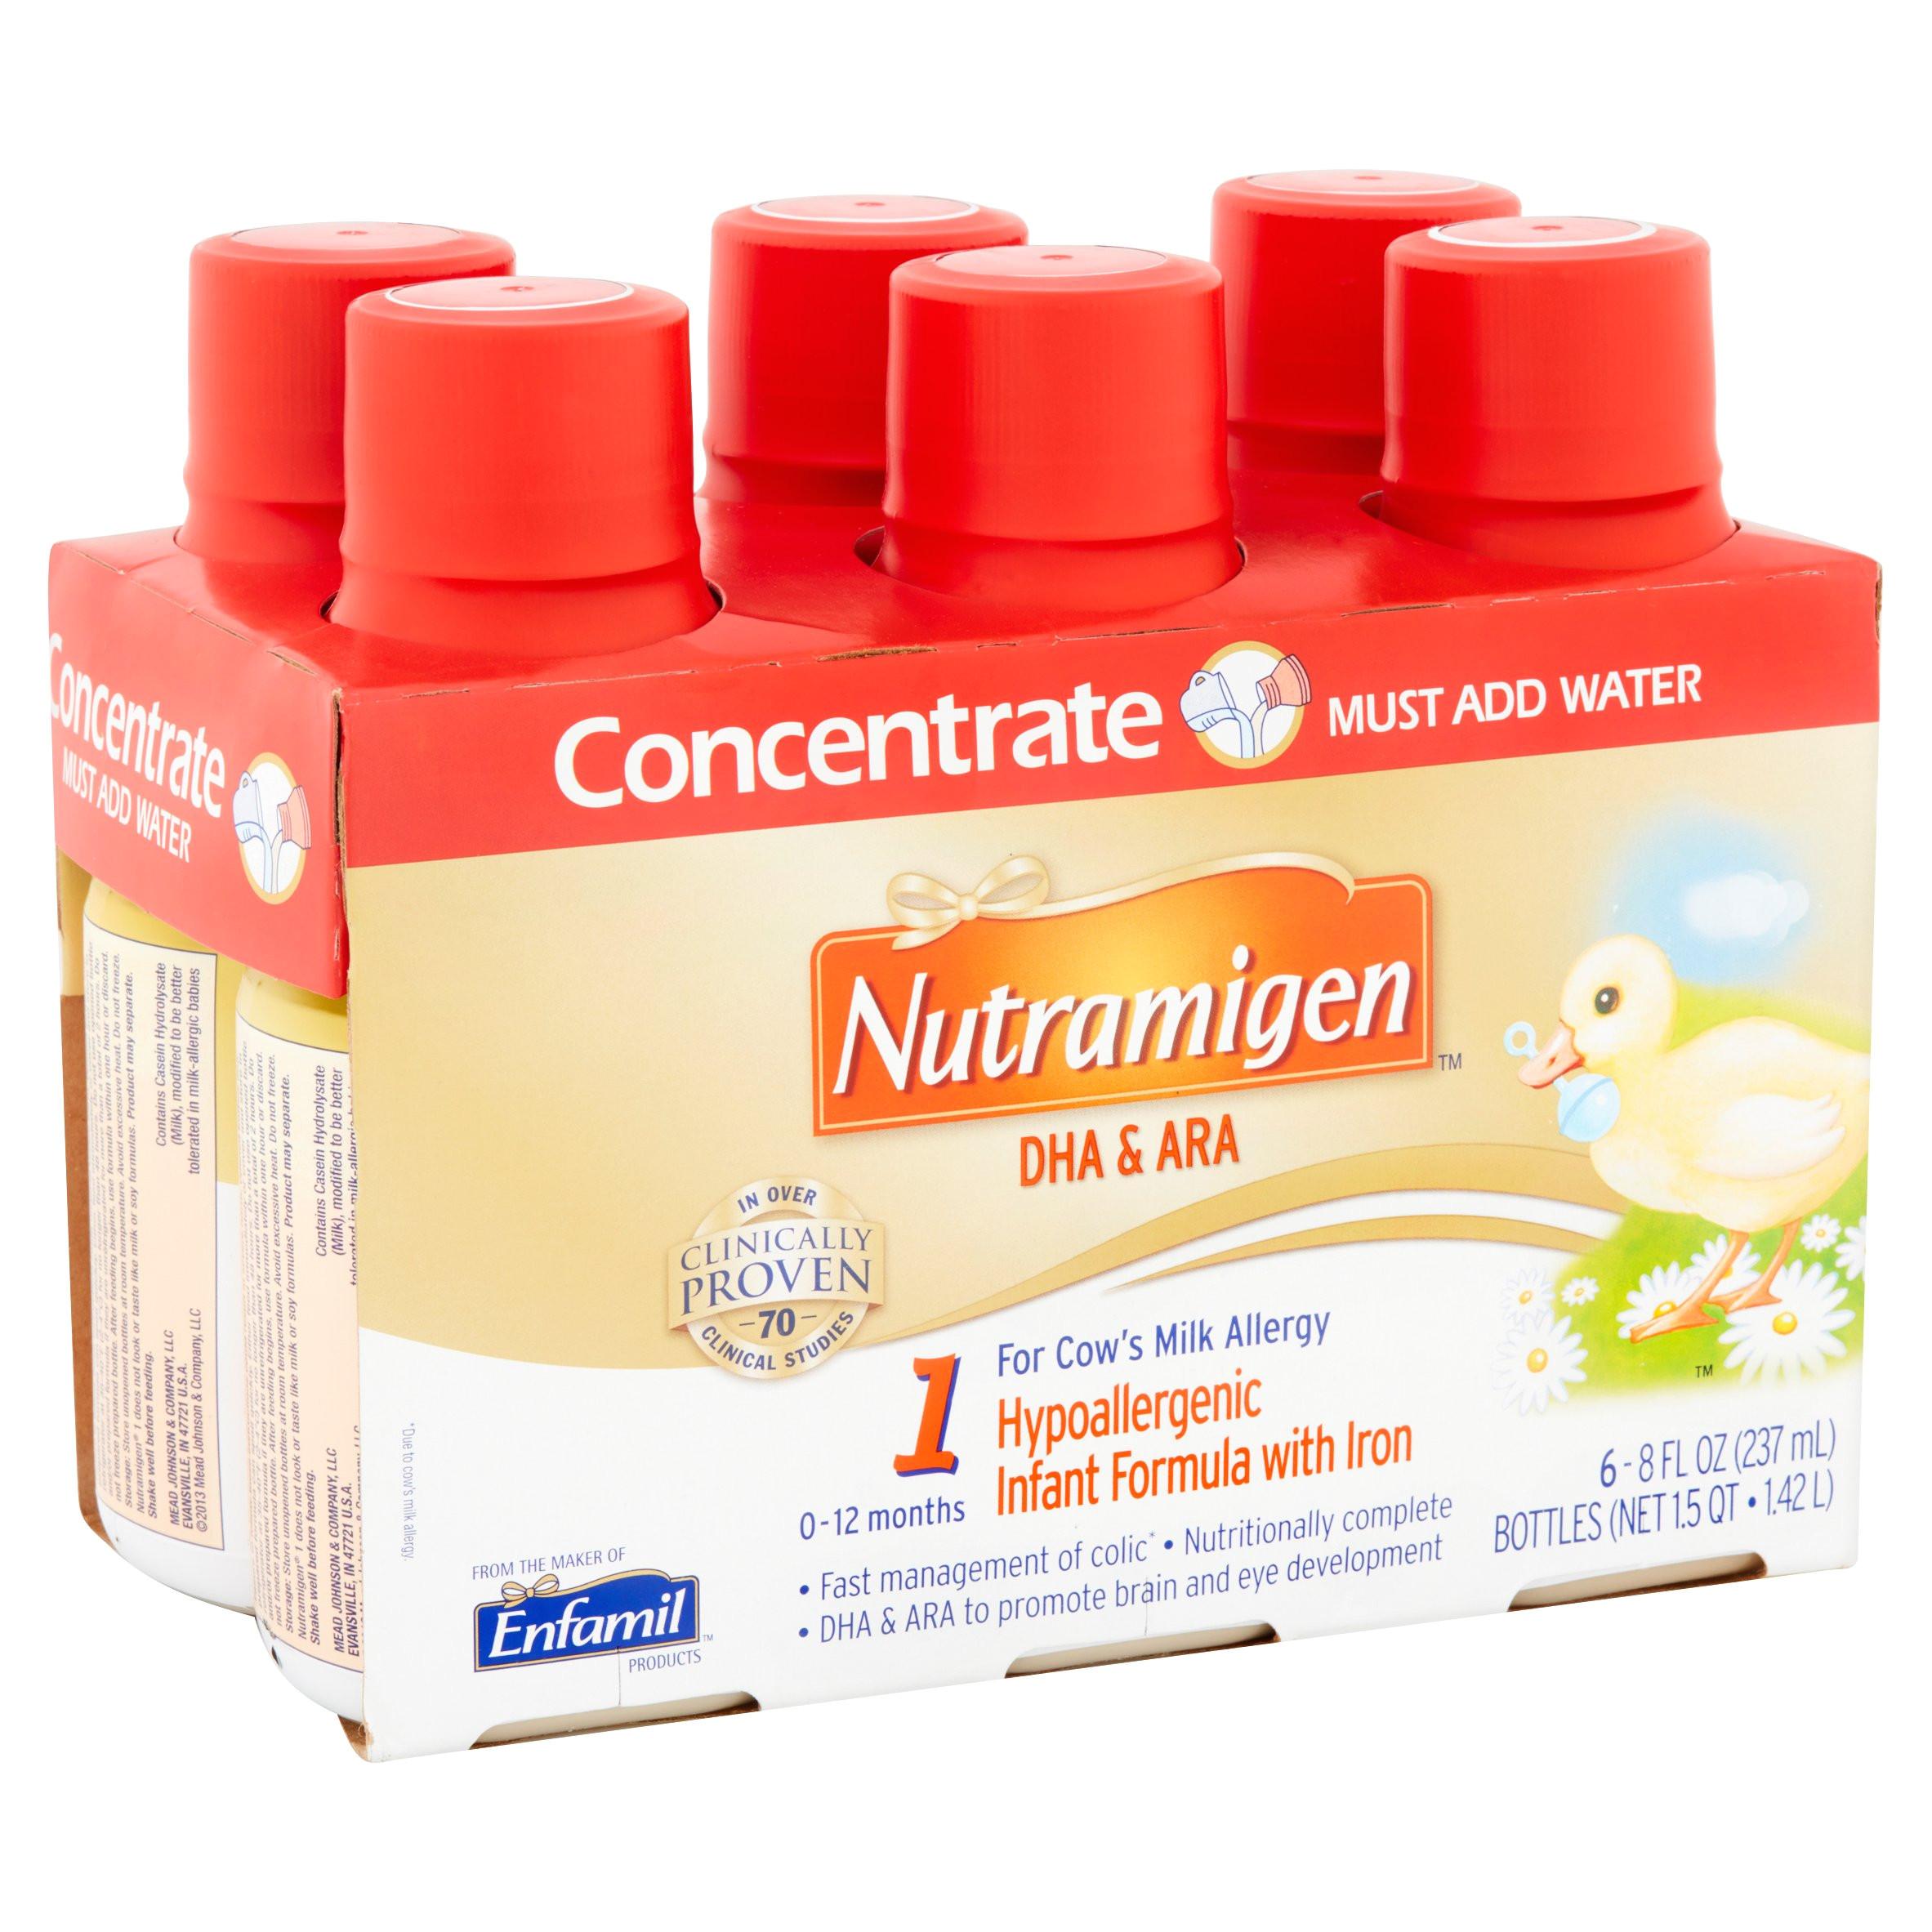 nutramigen 1 dha ara hypoallergenic infant formula with iron 0 12 months 8 fl oz 24 pack walmart com